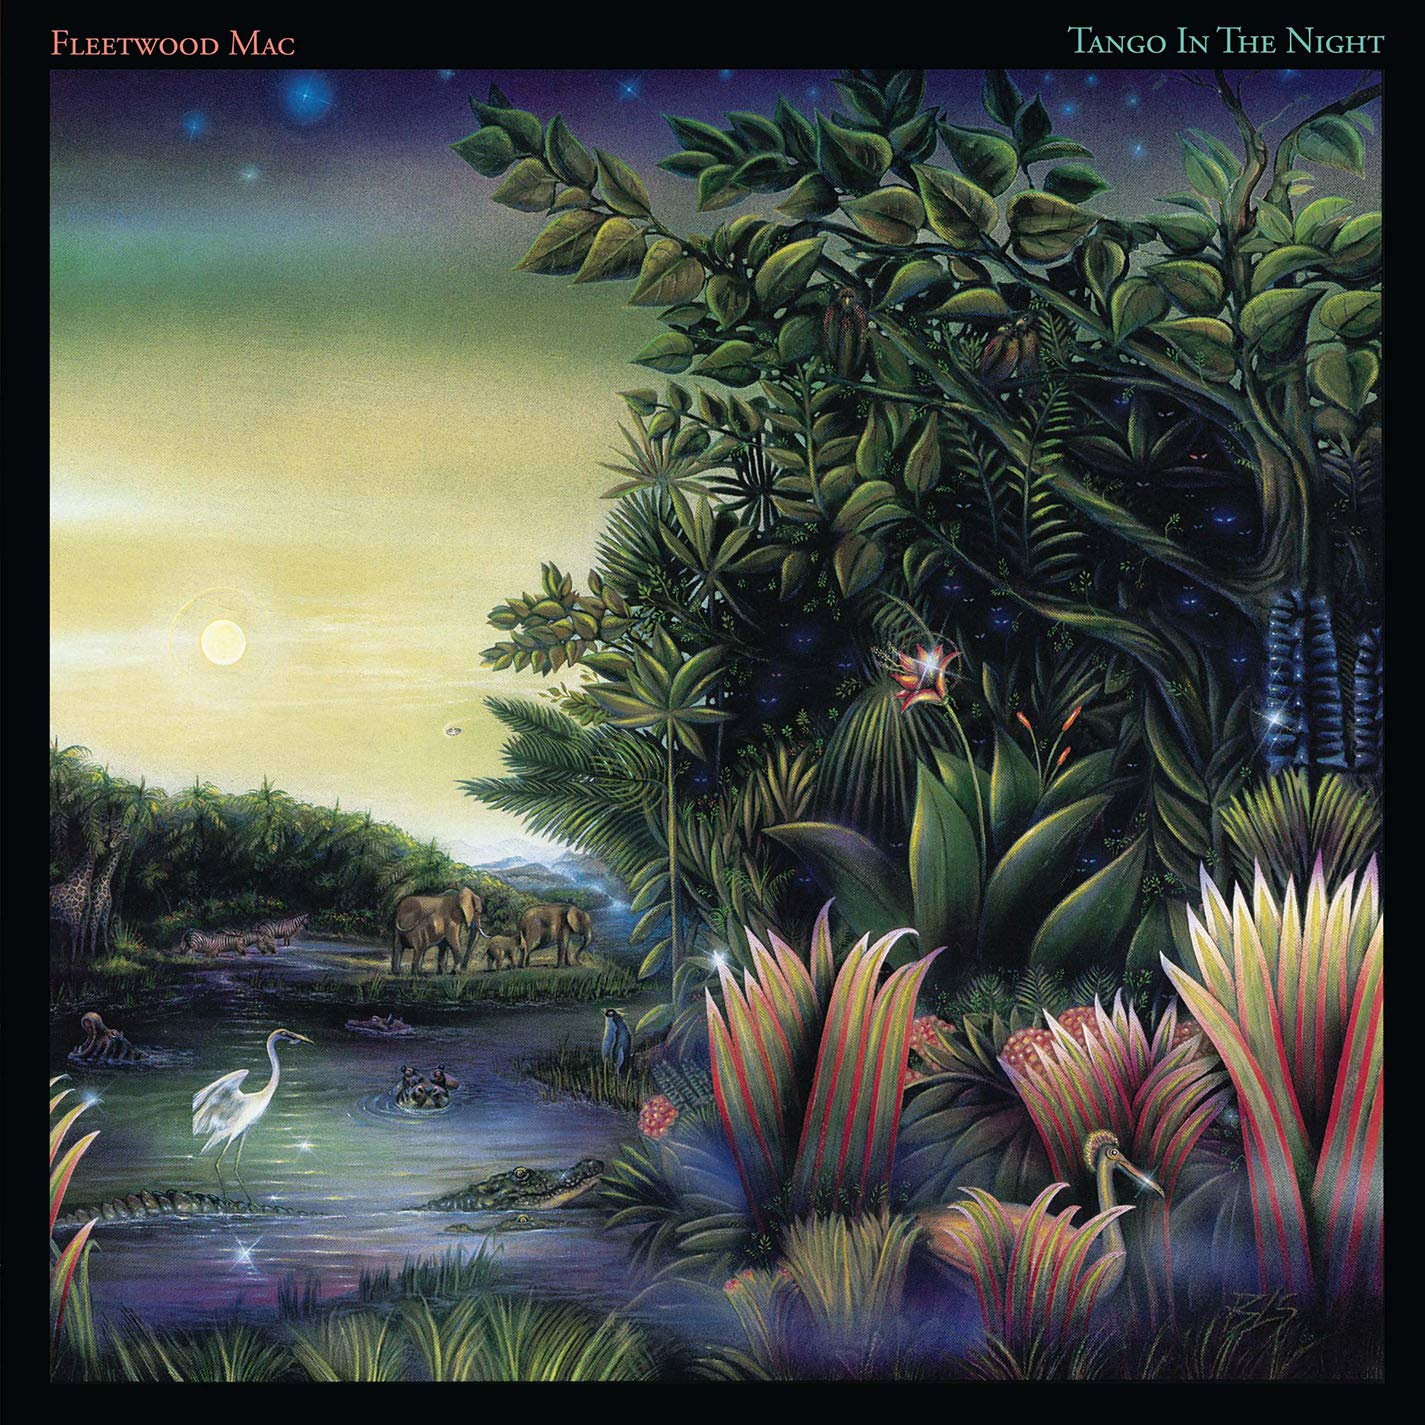 Fleetwood Mac - Tango In The Night (Expanded)(2CD) - Amazon.com Music